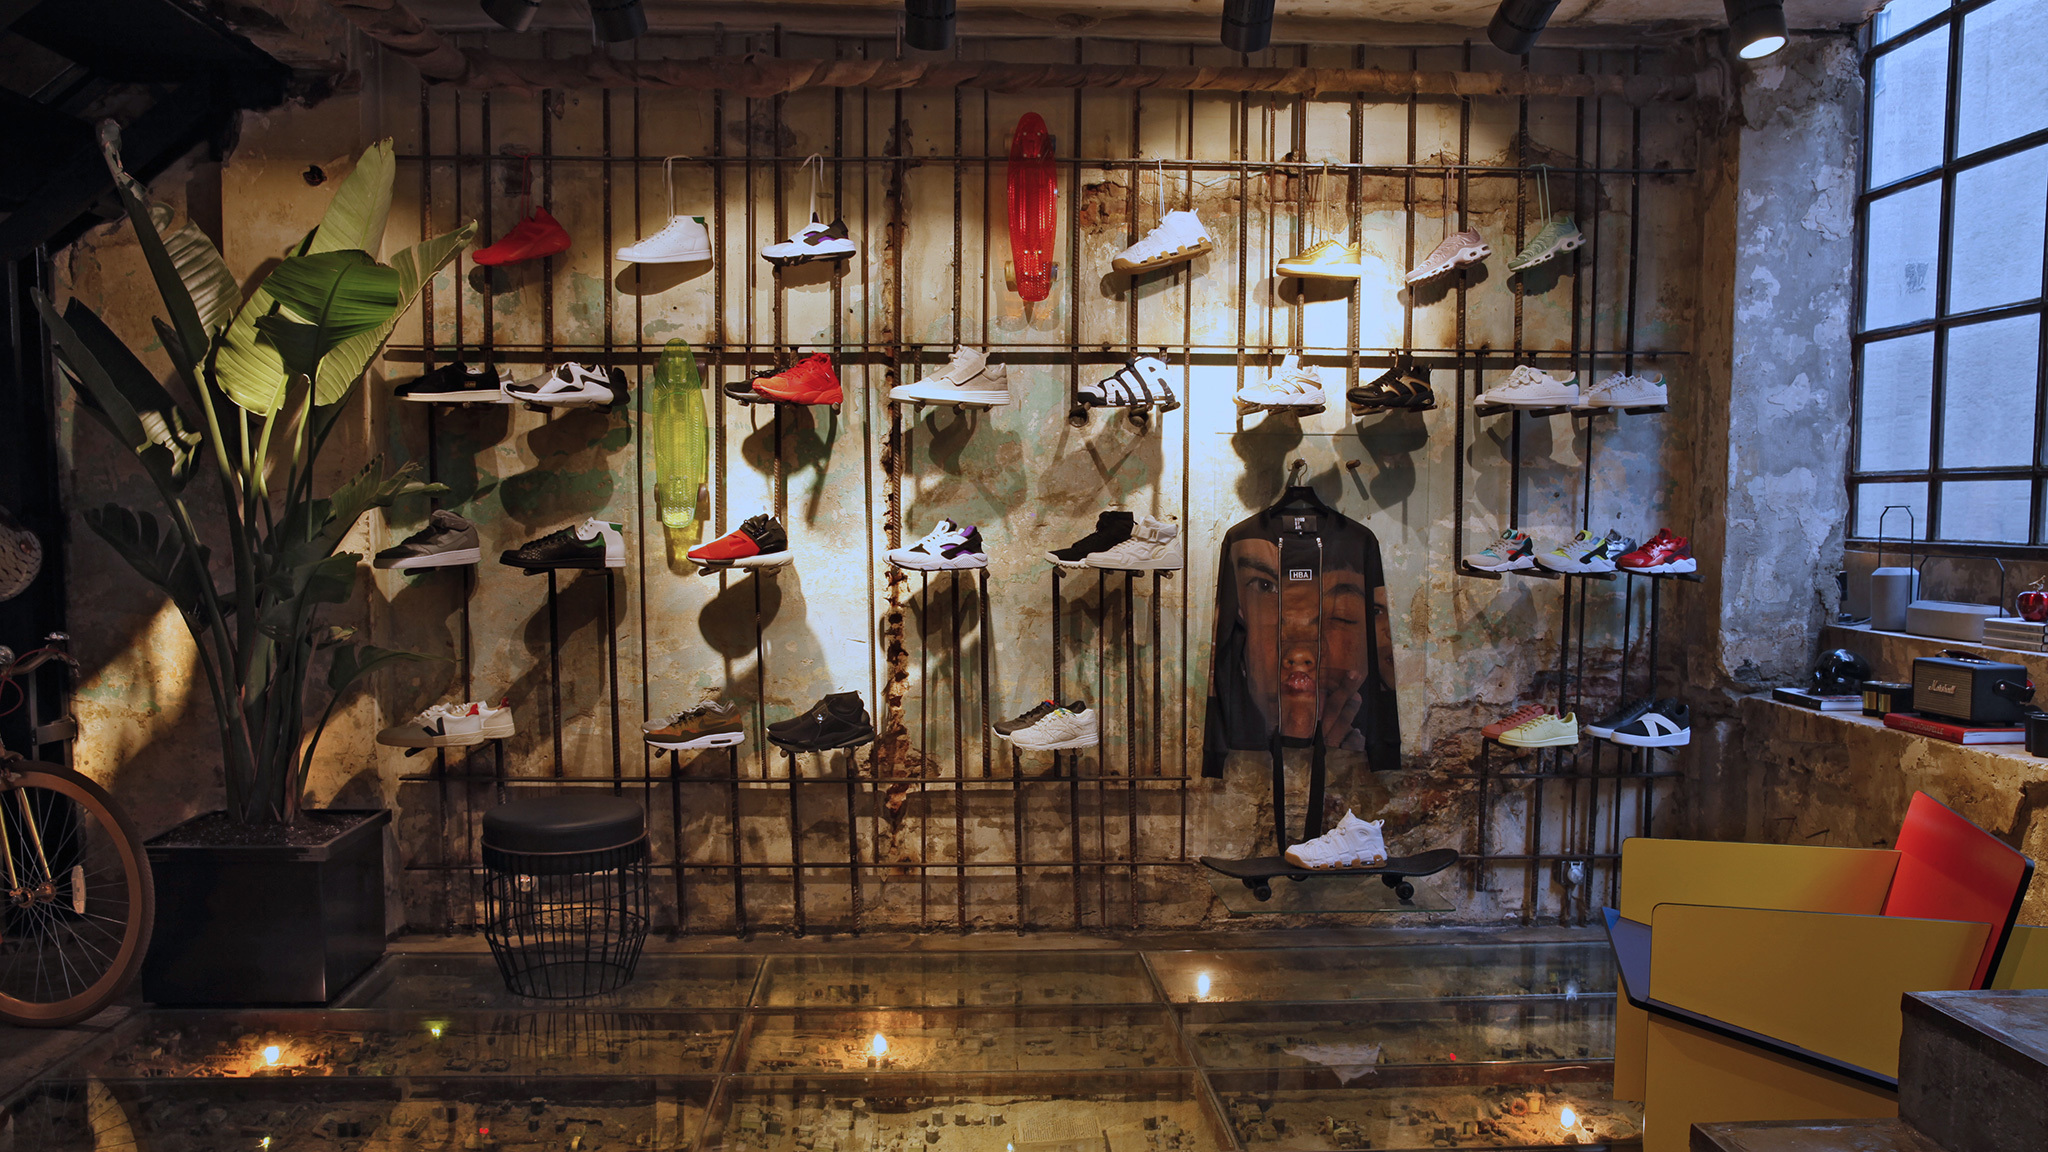 shopi go no:62 mağazasının sneaker reyonu